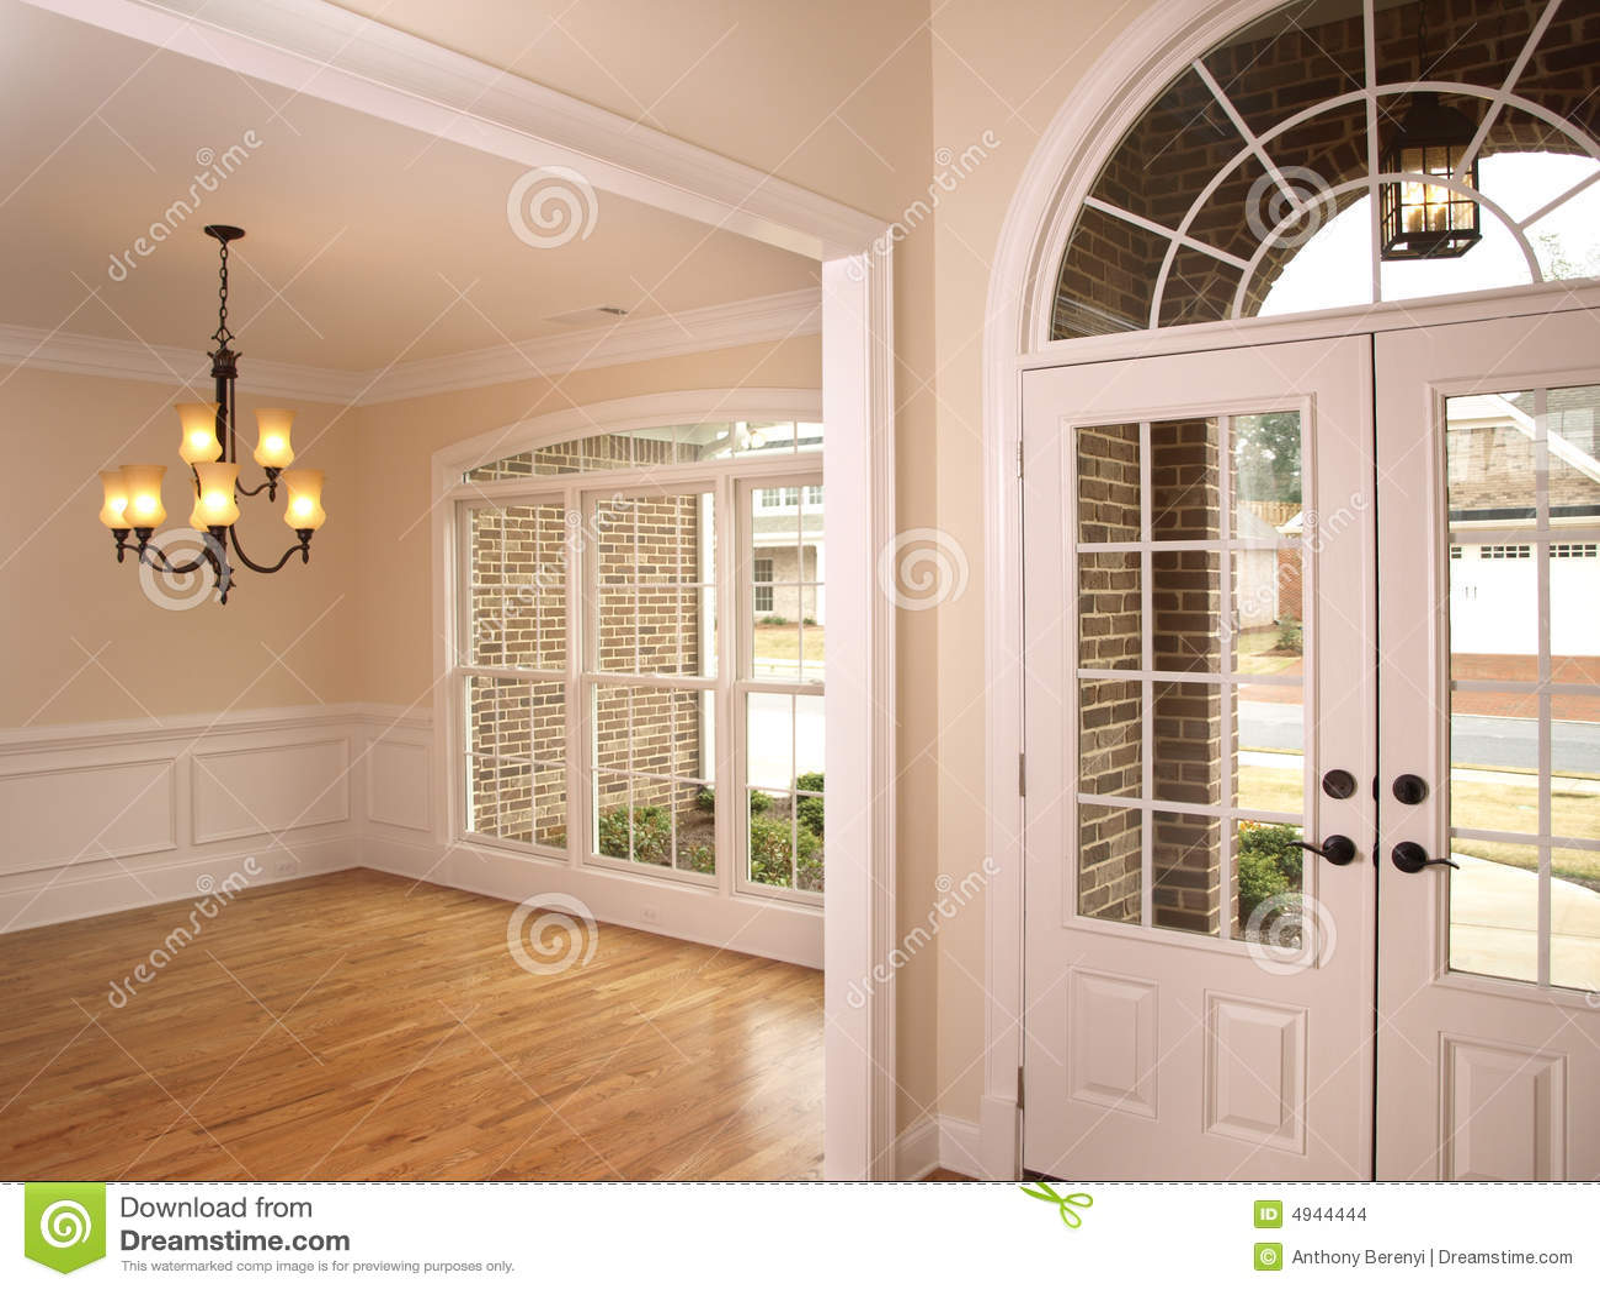 Puertas De Salon Con Cristal Dise Os Arquitect Nicos Mimasku Com ~ Cristales Para Puertas De Salon